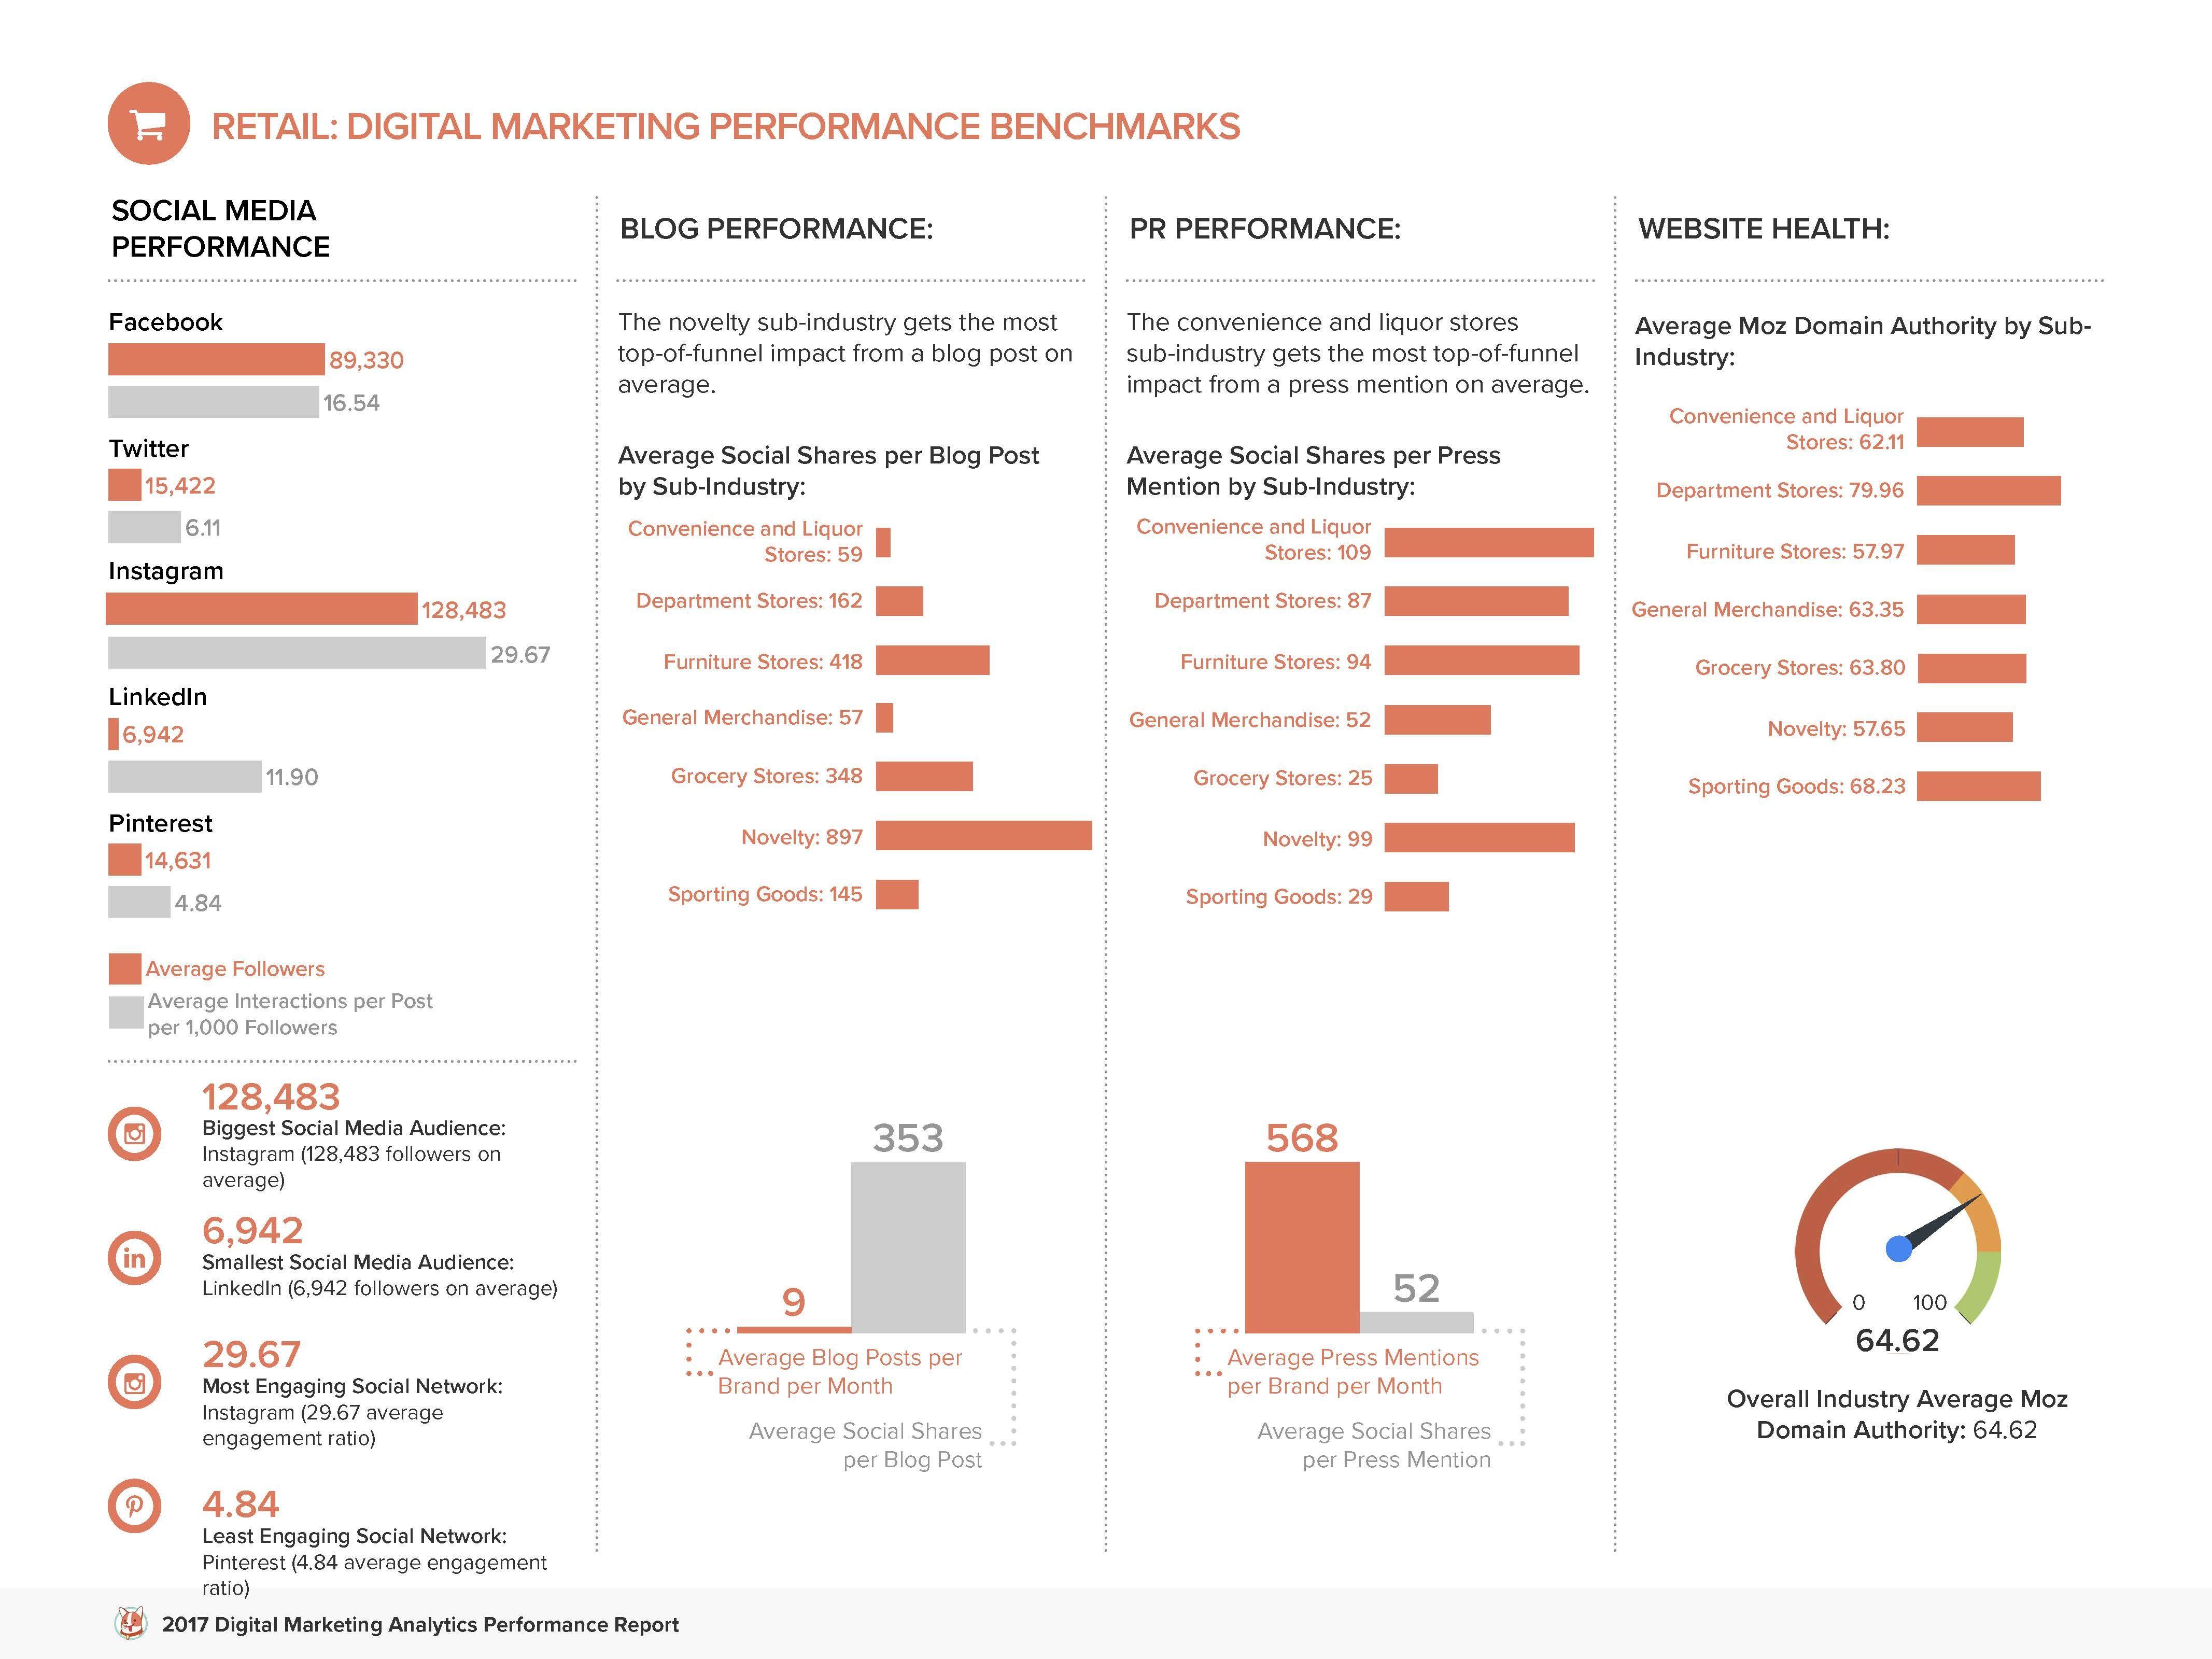 digital marketing analytics performance report marketing. Black Bedroom Furniture Sets. Home Design Ideas